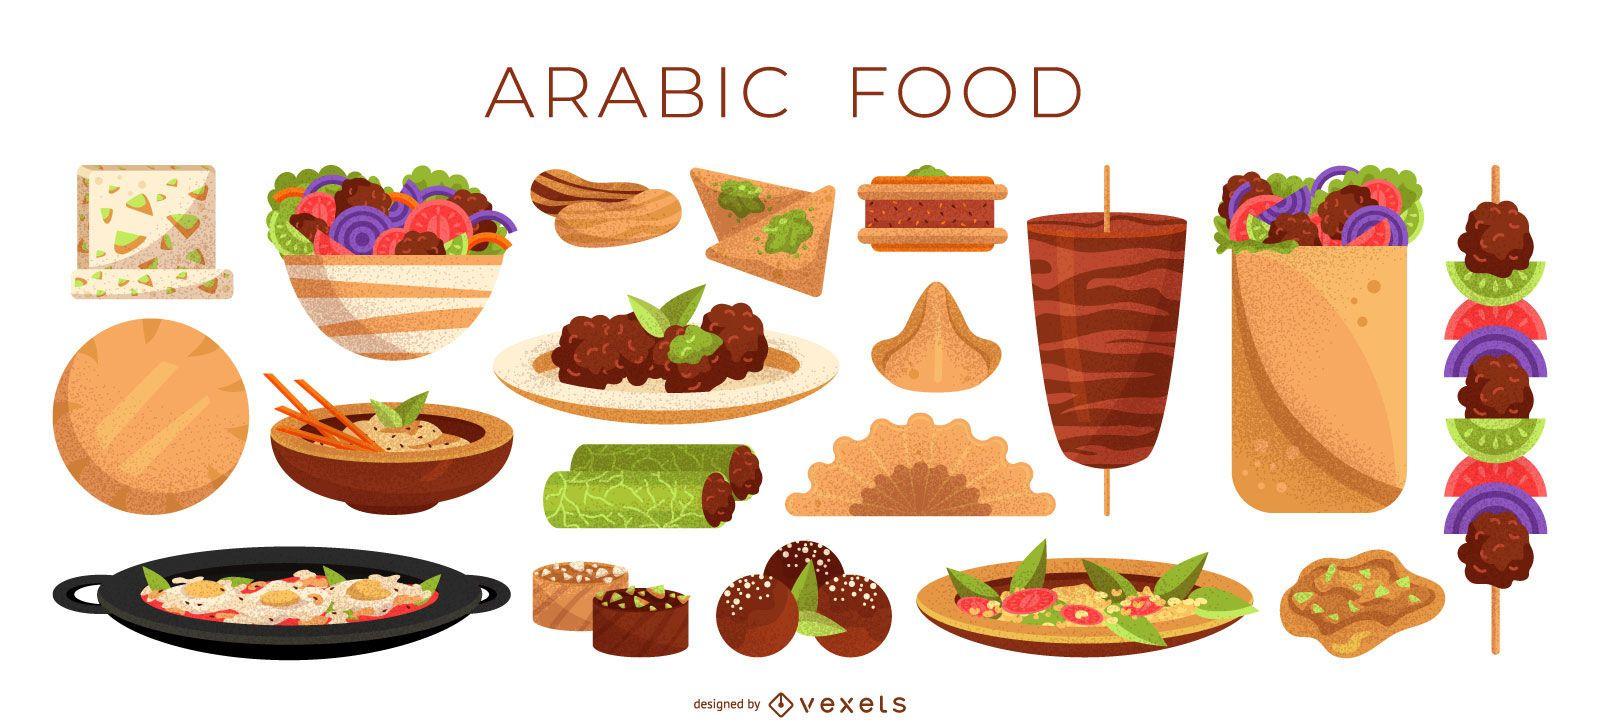 Arabic food illustration collection